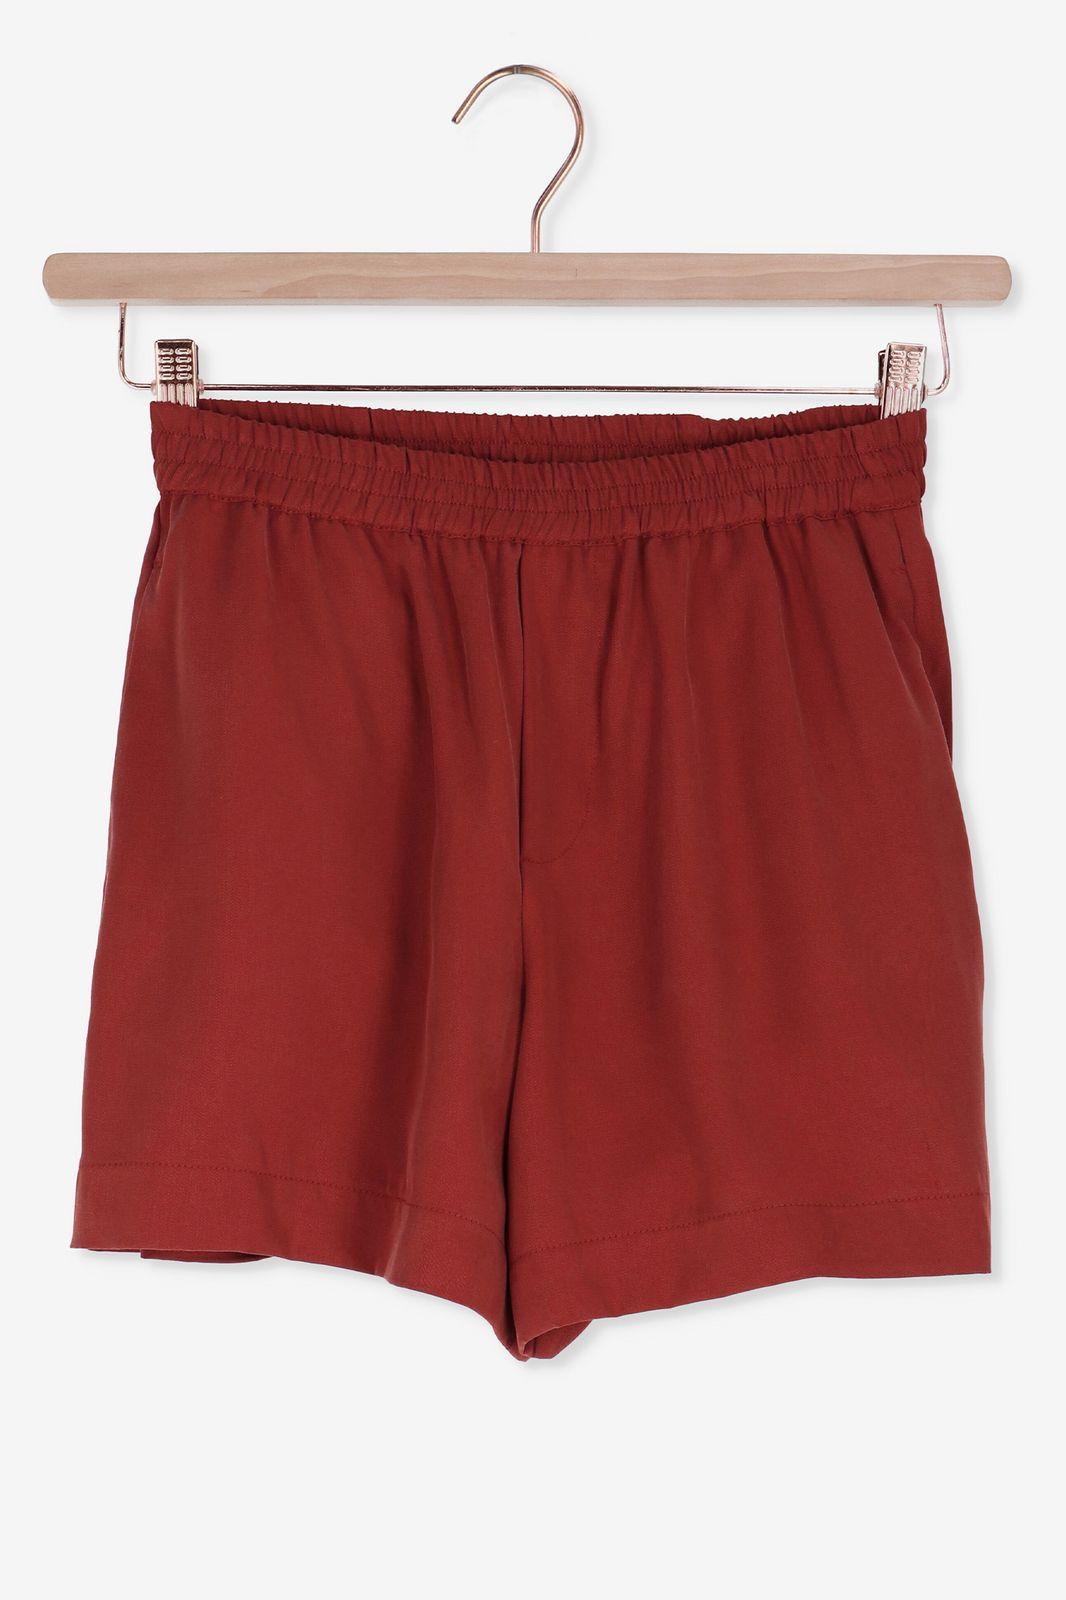 Donkerrode korte broek - Dames | Sissy-Boy